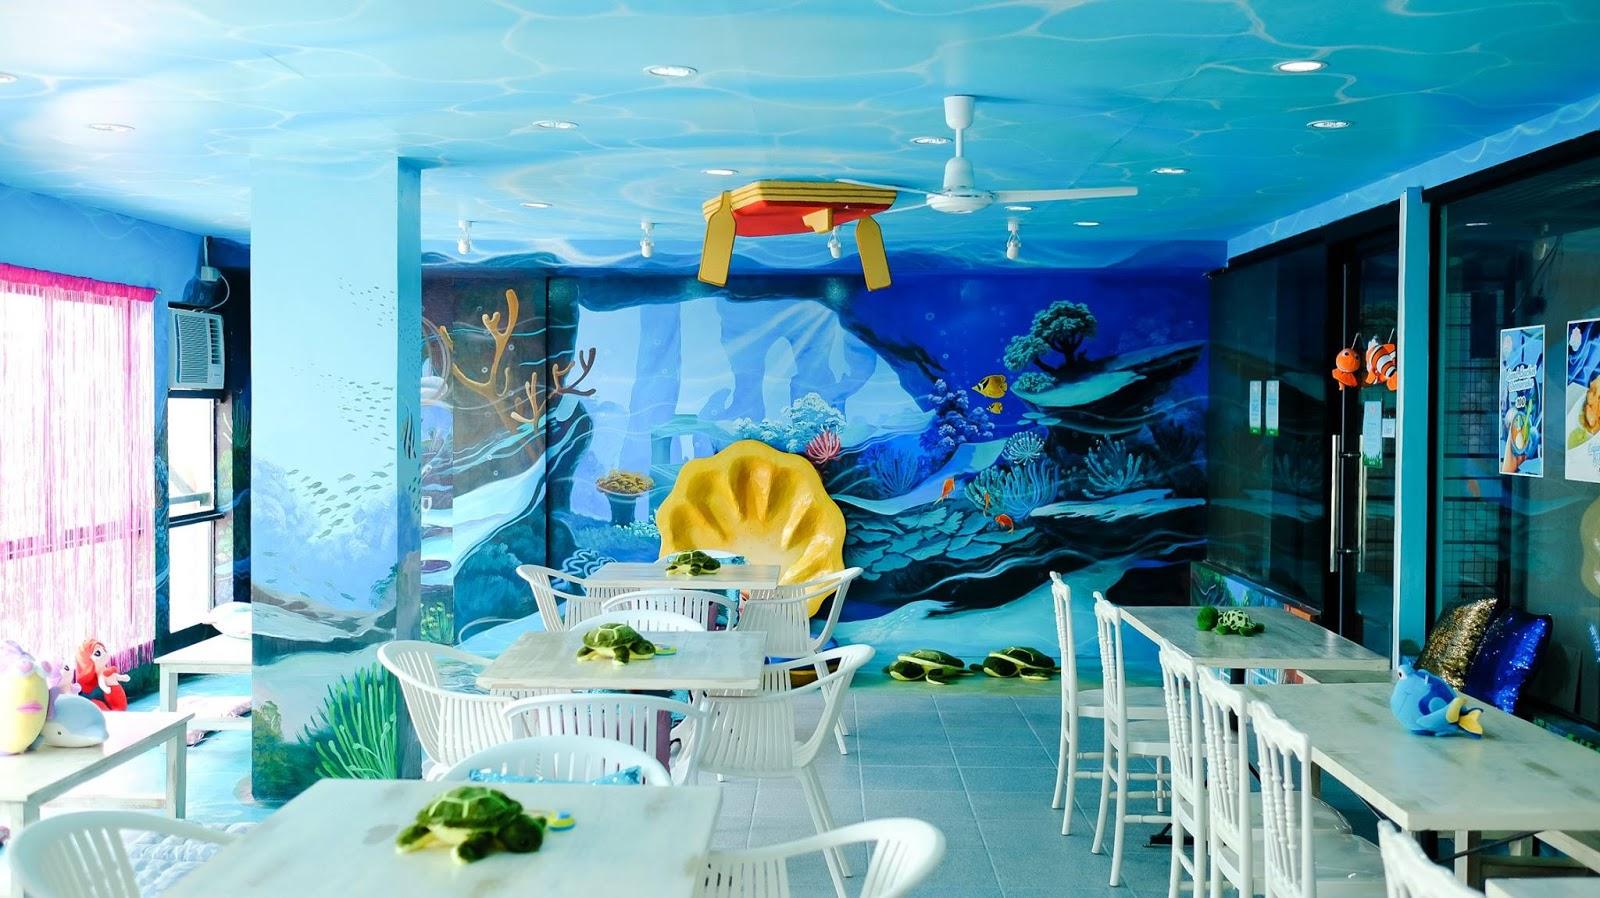 Rainbow Dreams Cafe Quezon City